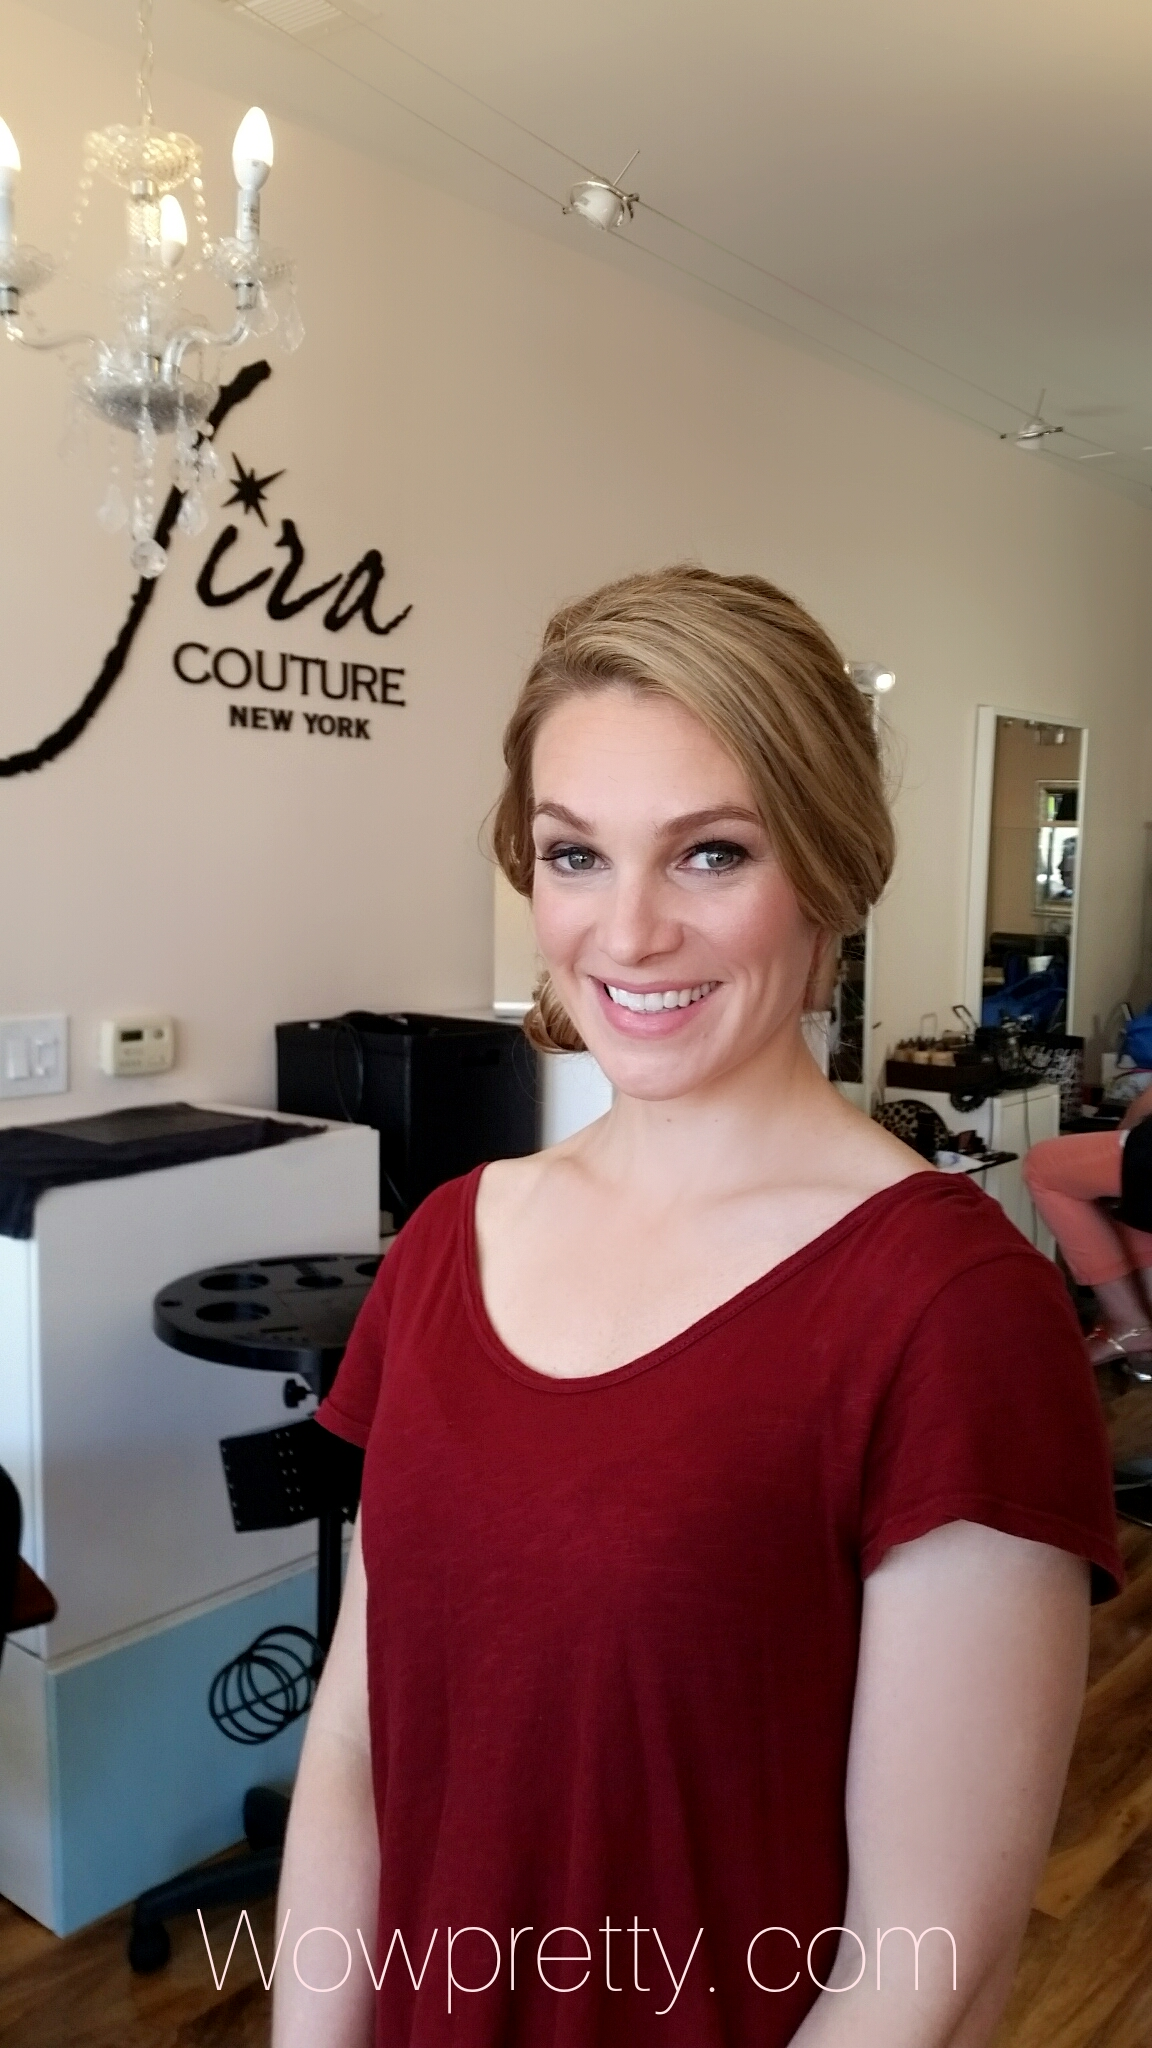 wedding-trial-makeup-and-hair_26825370582_o.jpg